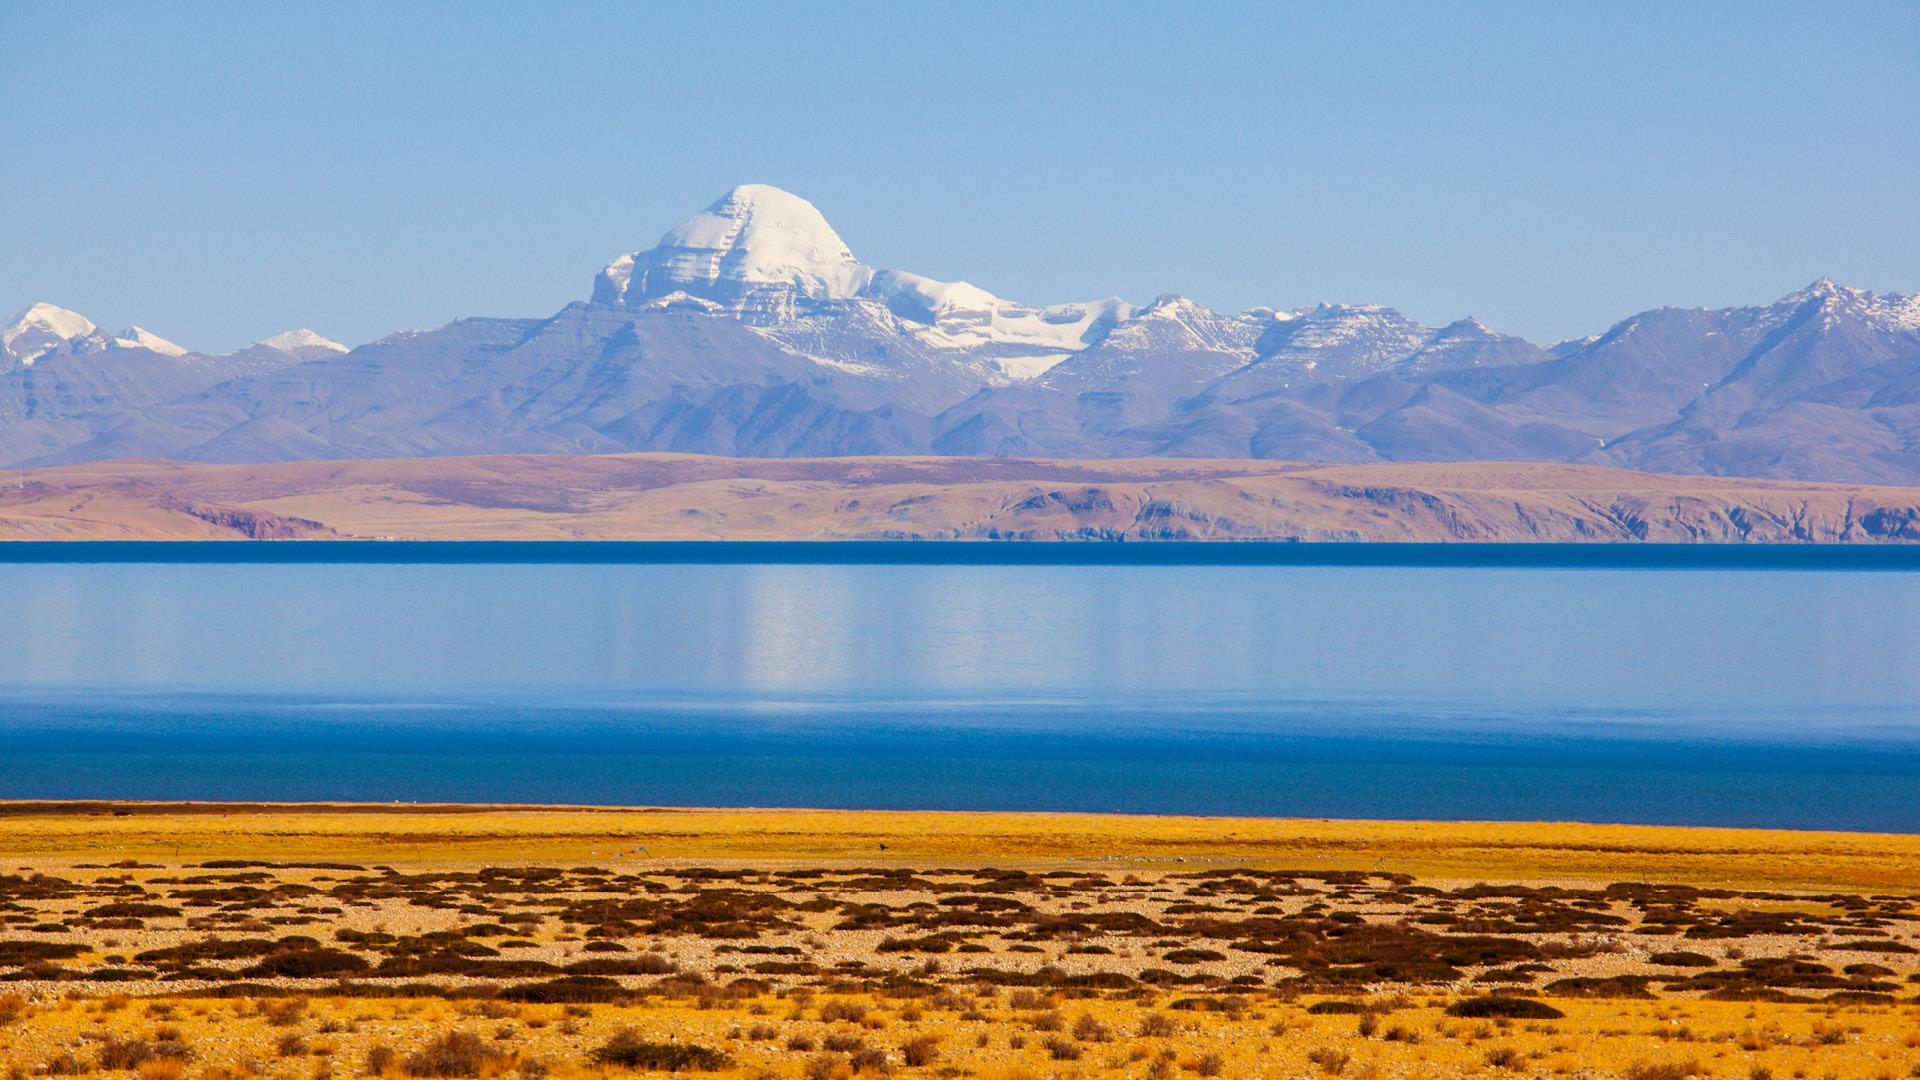 Kailash mansarovar may soon get unesco world heritage title - Kailash mansarovar om ...